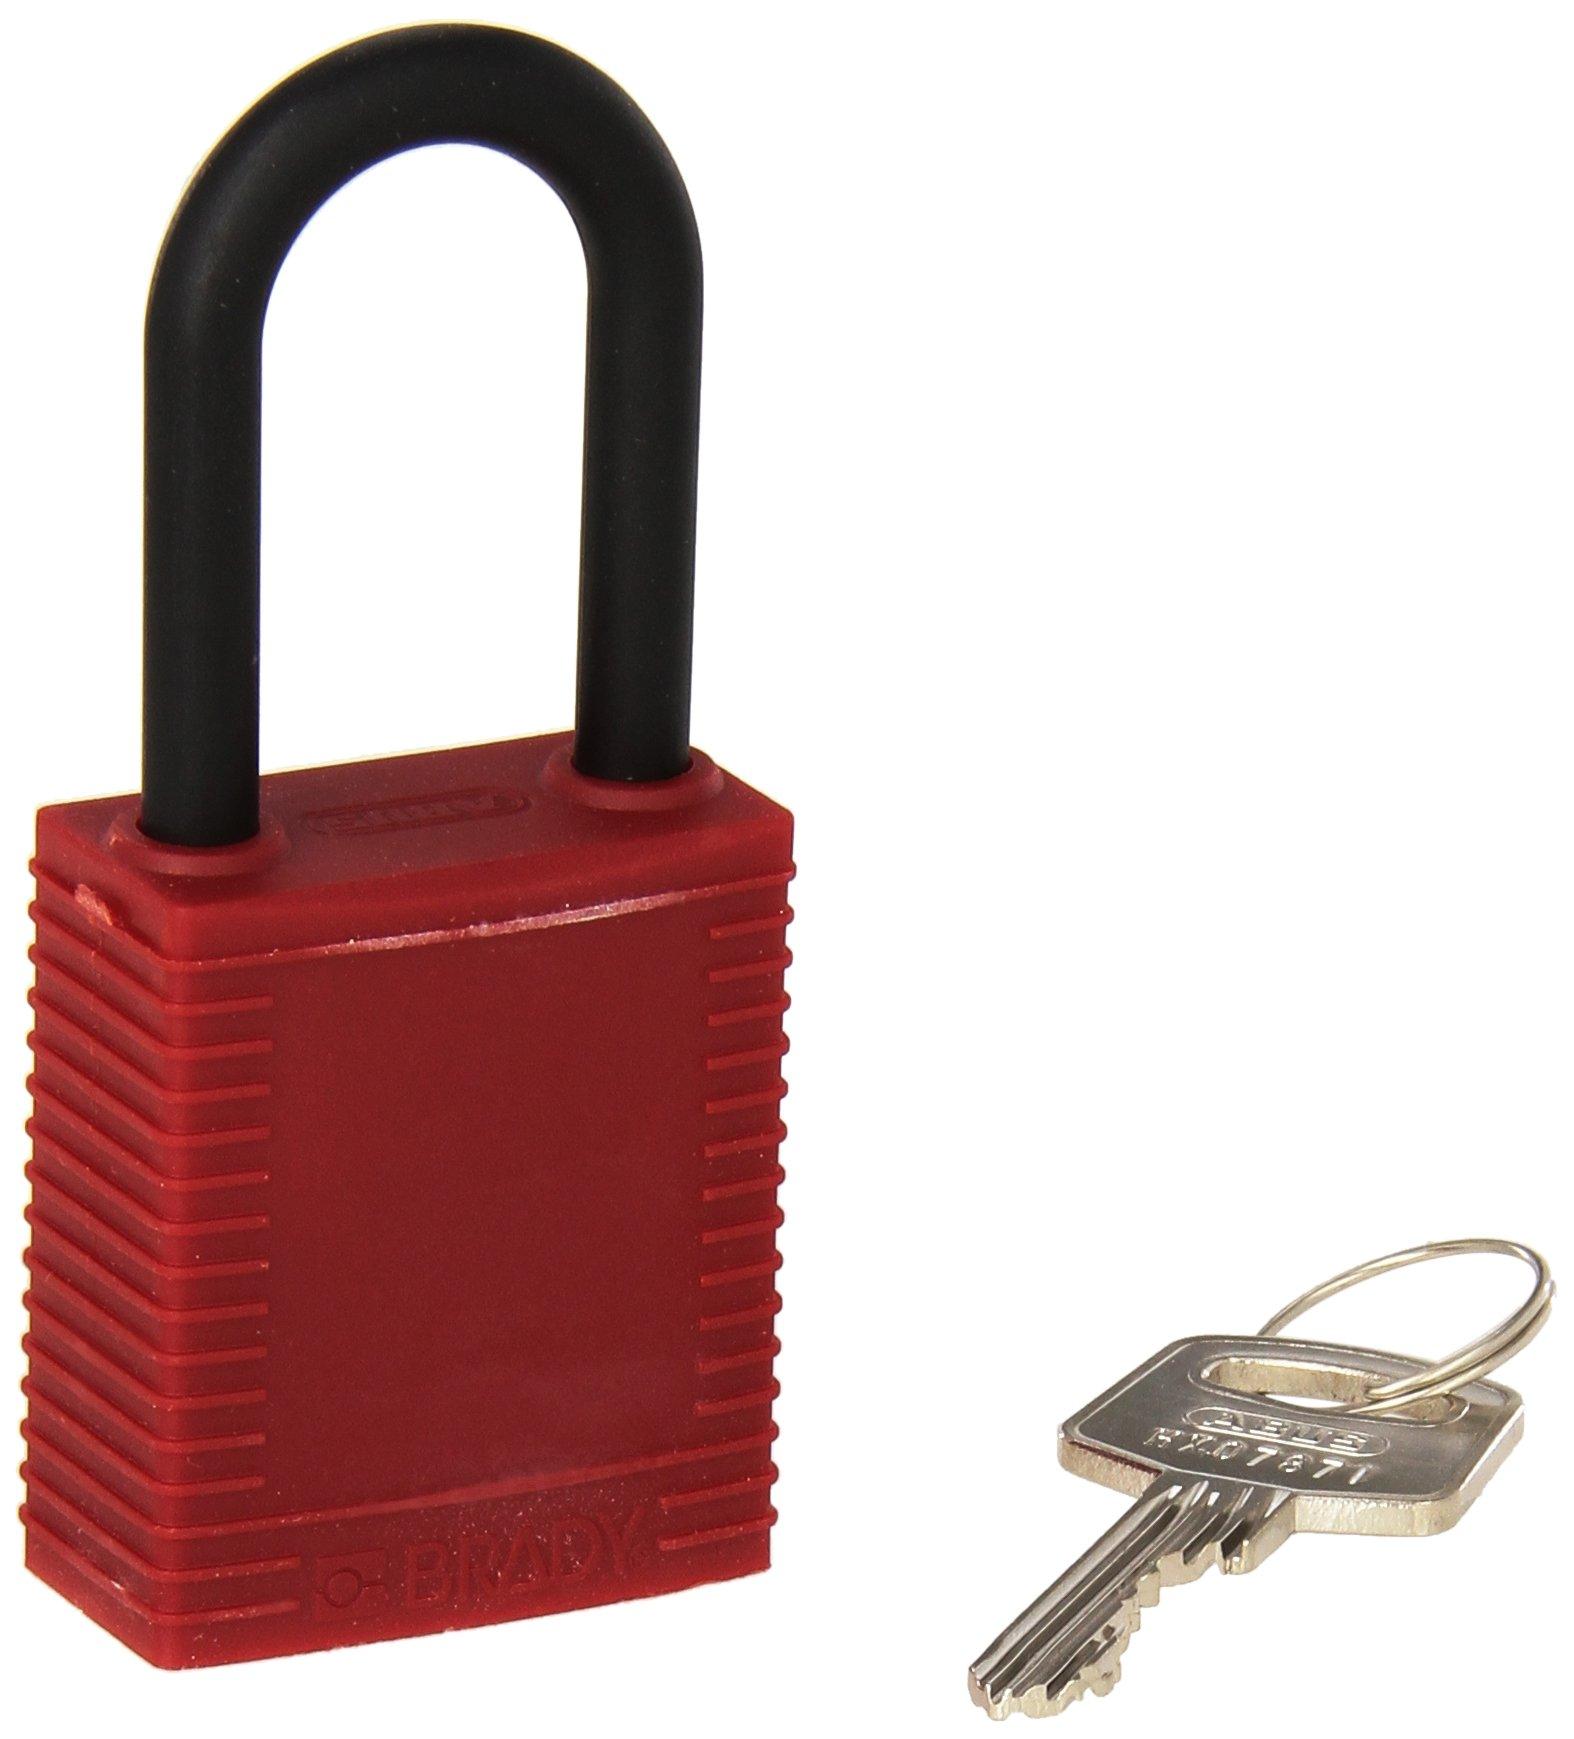 Brady 123342 Lockout Padlock, Keyed Alike, 1/4'' x 1-1/2'', Red